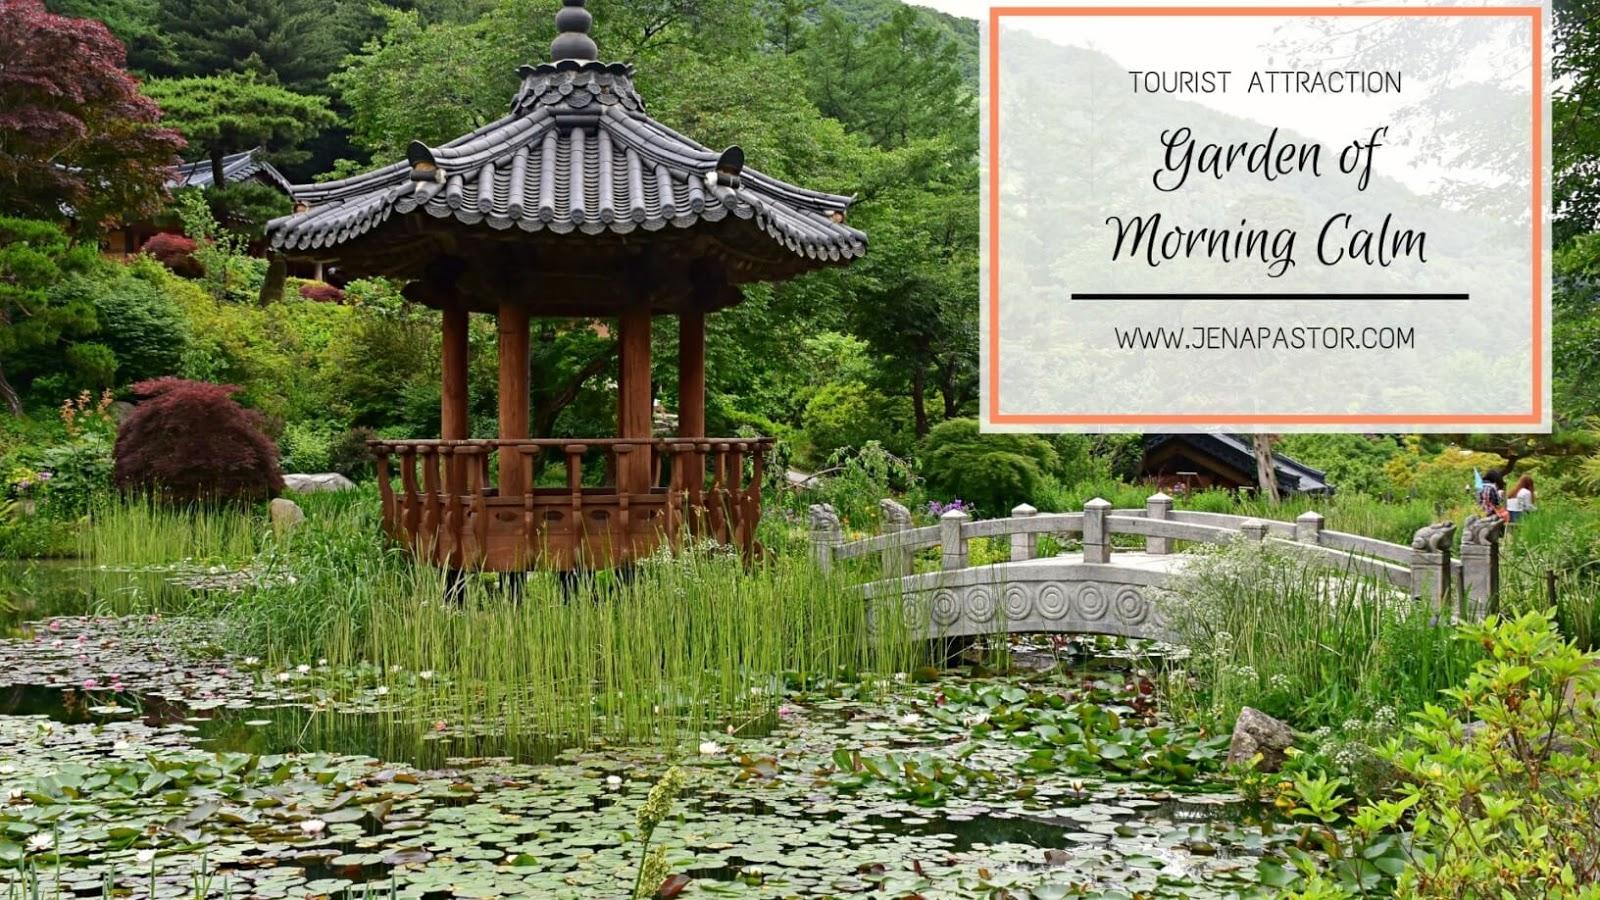 pond, garden, hanok style roof gazebo